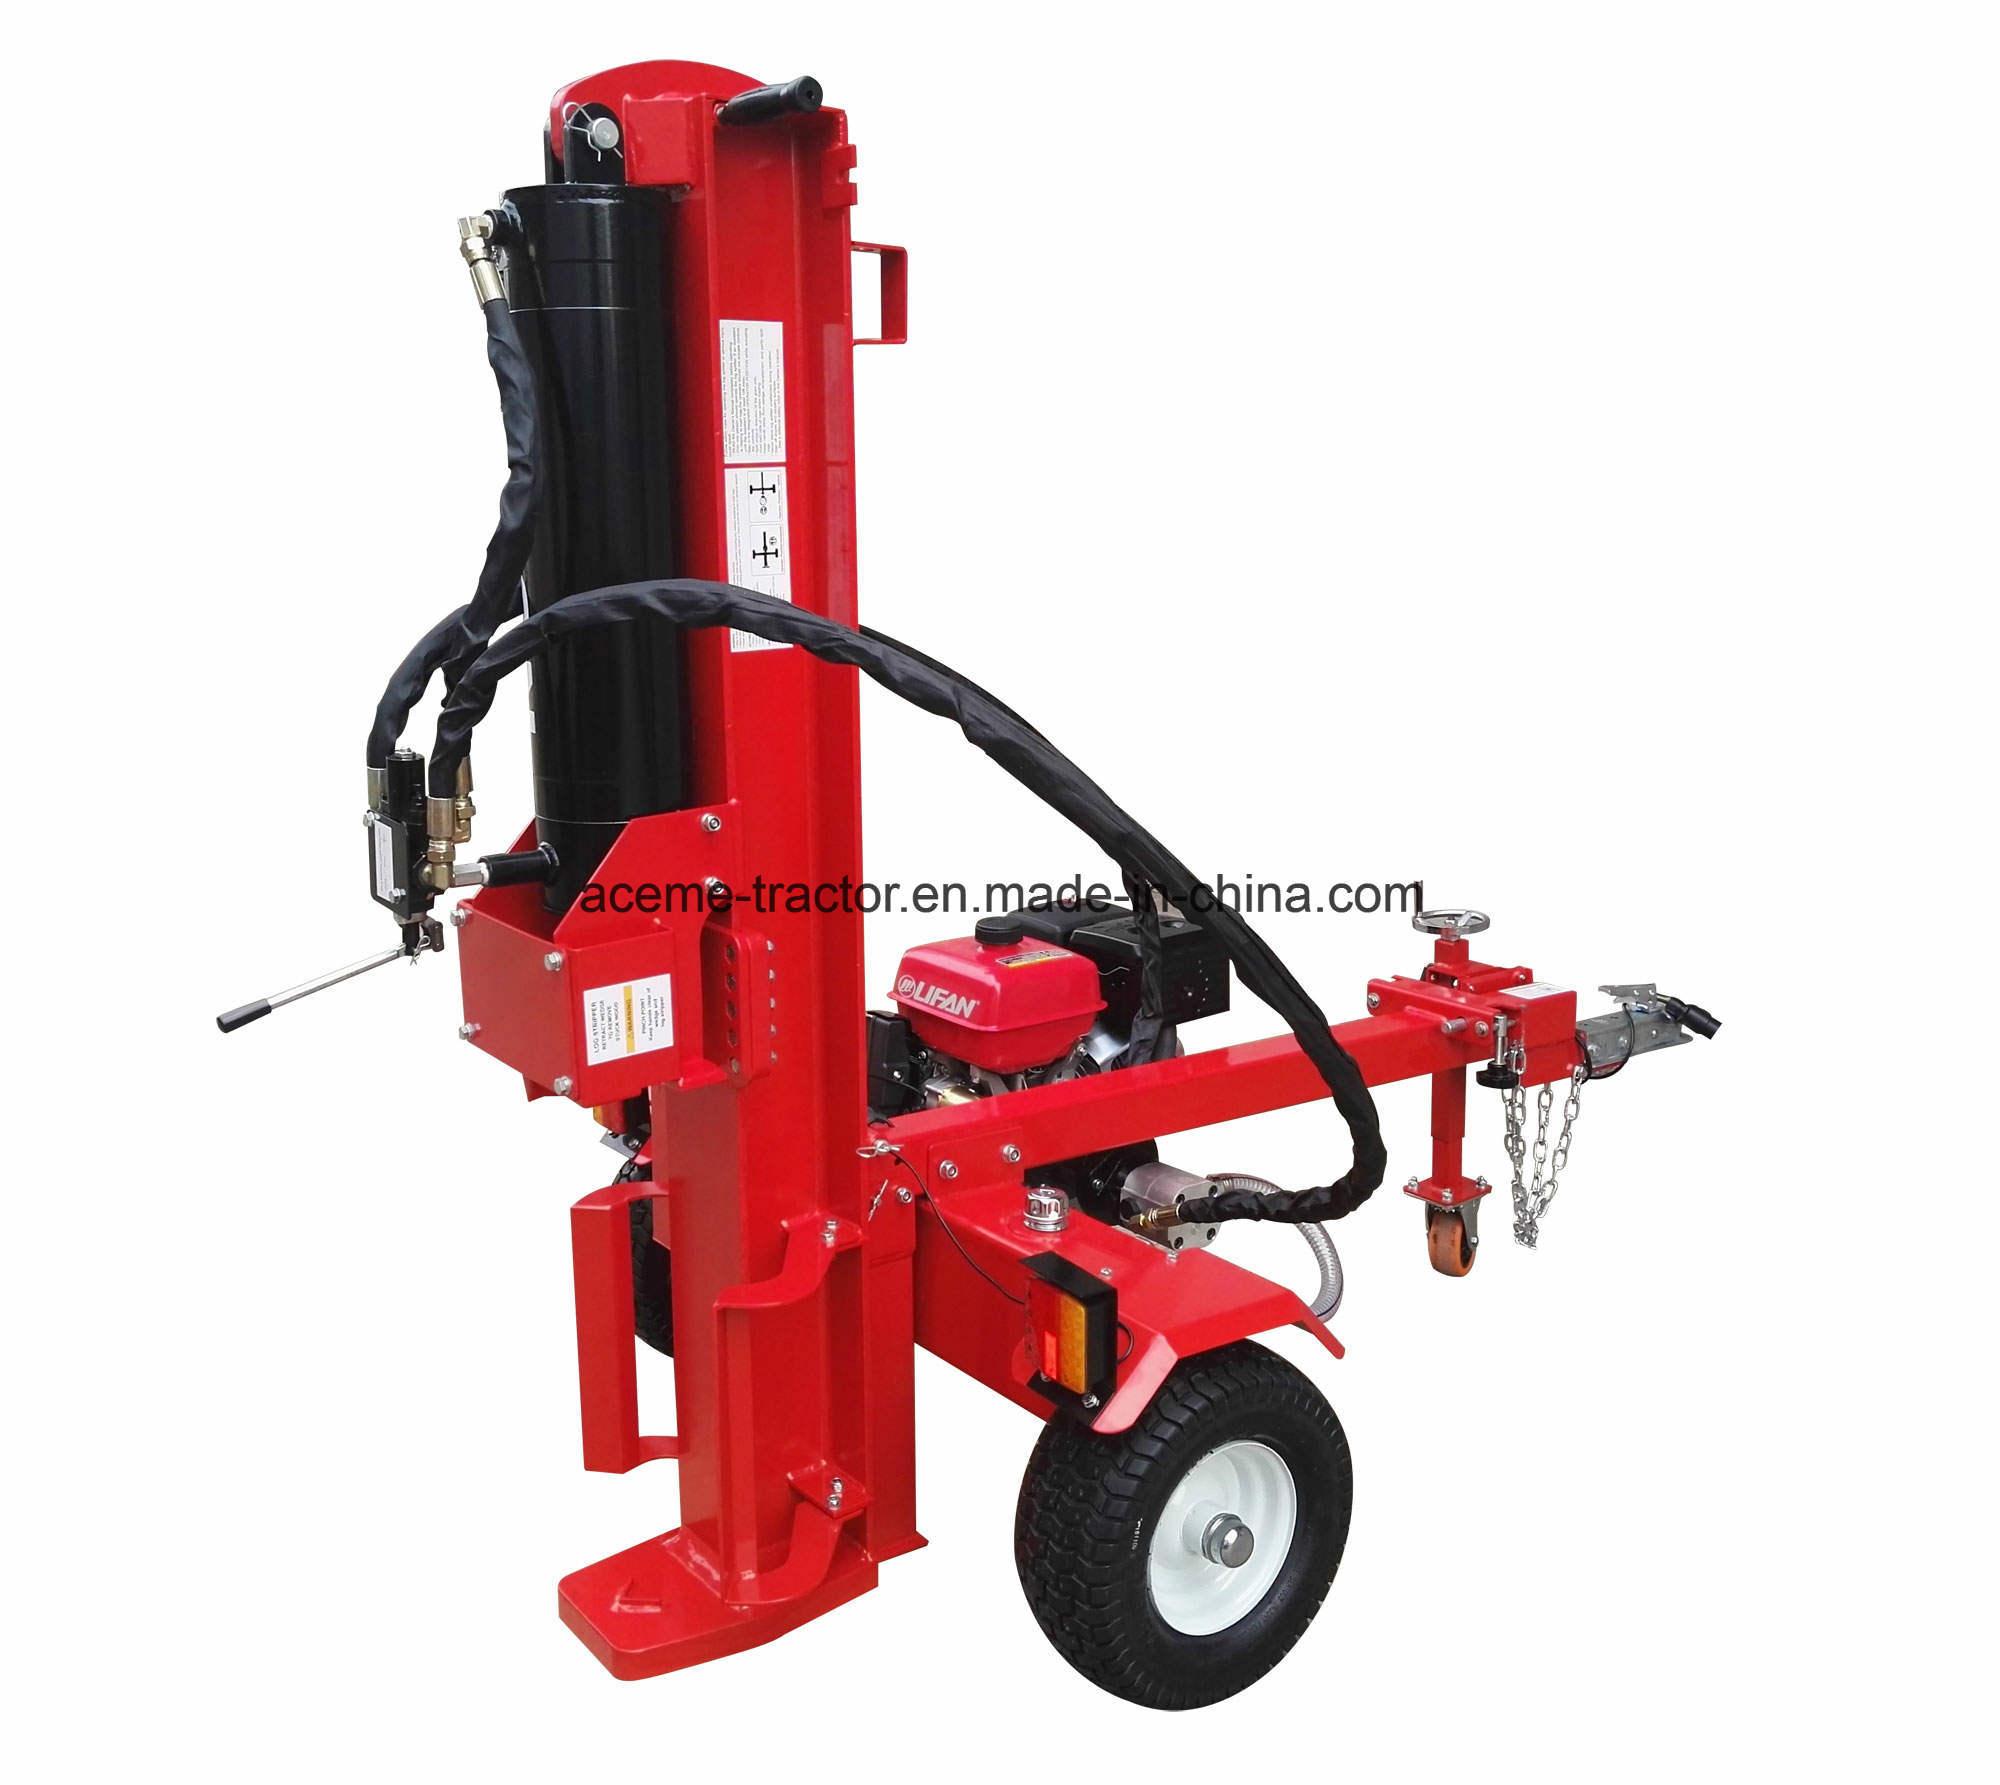 60t 15HP Lifan Gasoline Engine EU Log Splitter Ce EPA